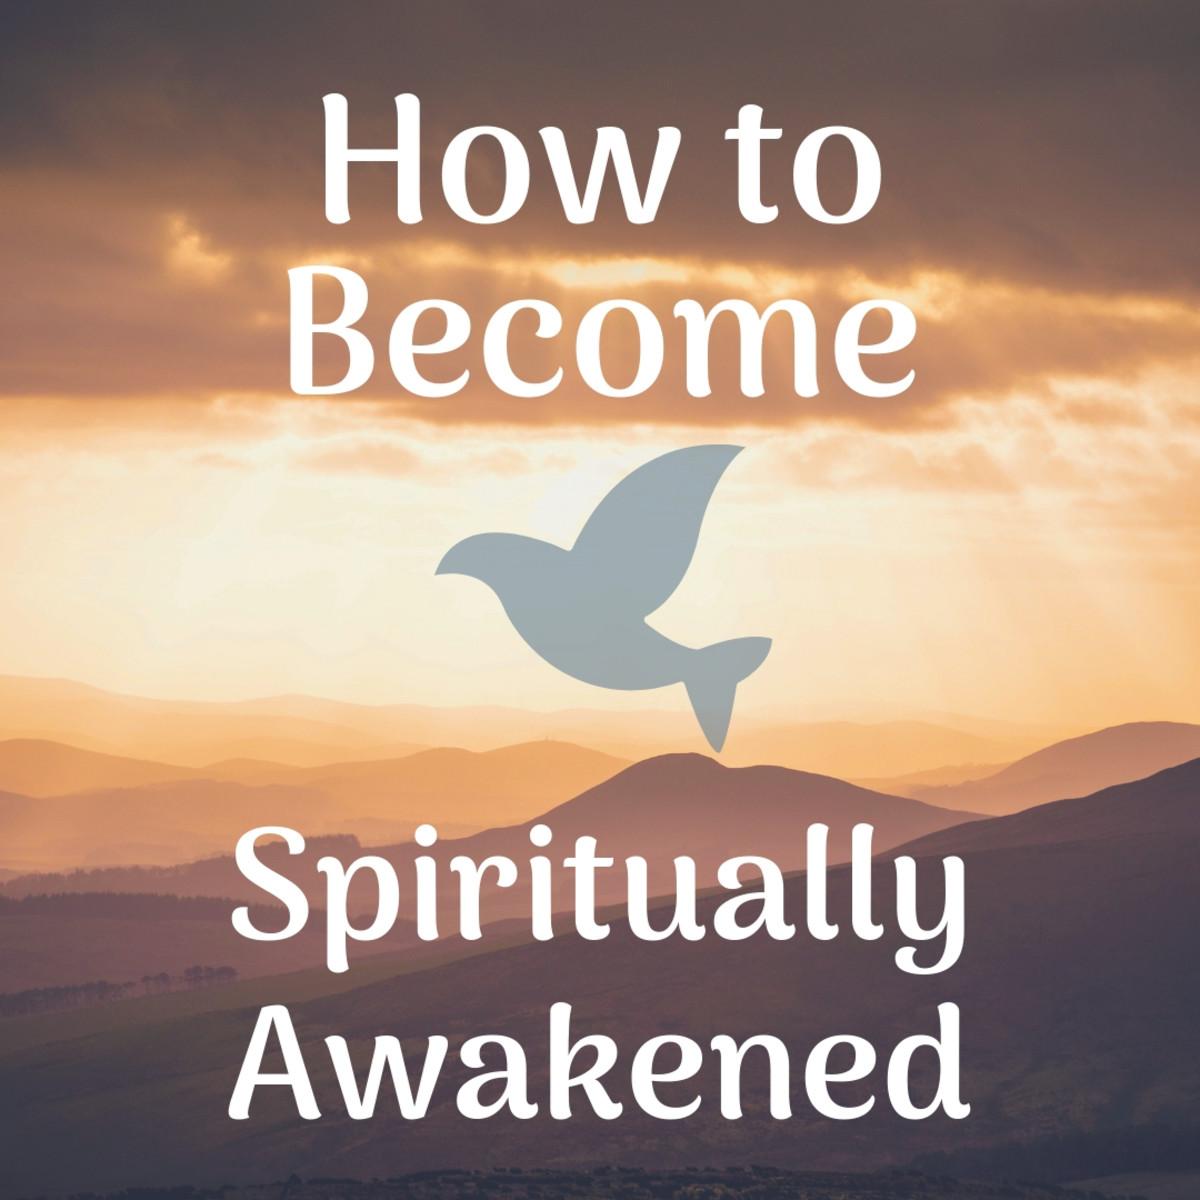 Spiritual Awakening and Characteristics of a Spiritually Awakened